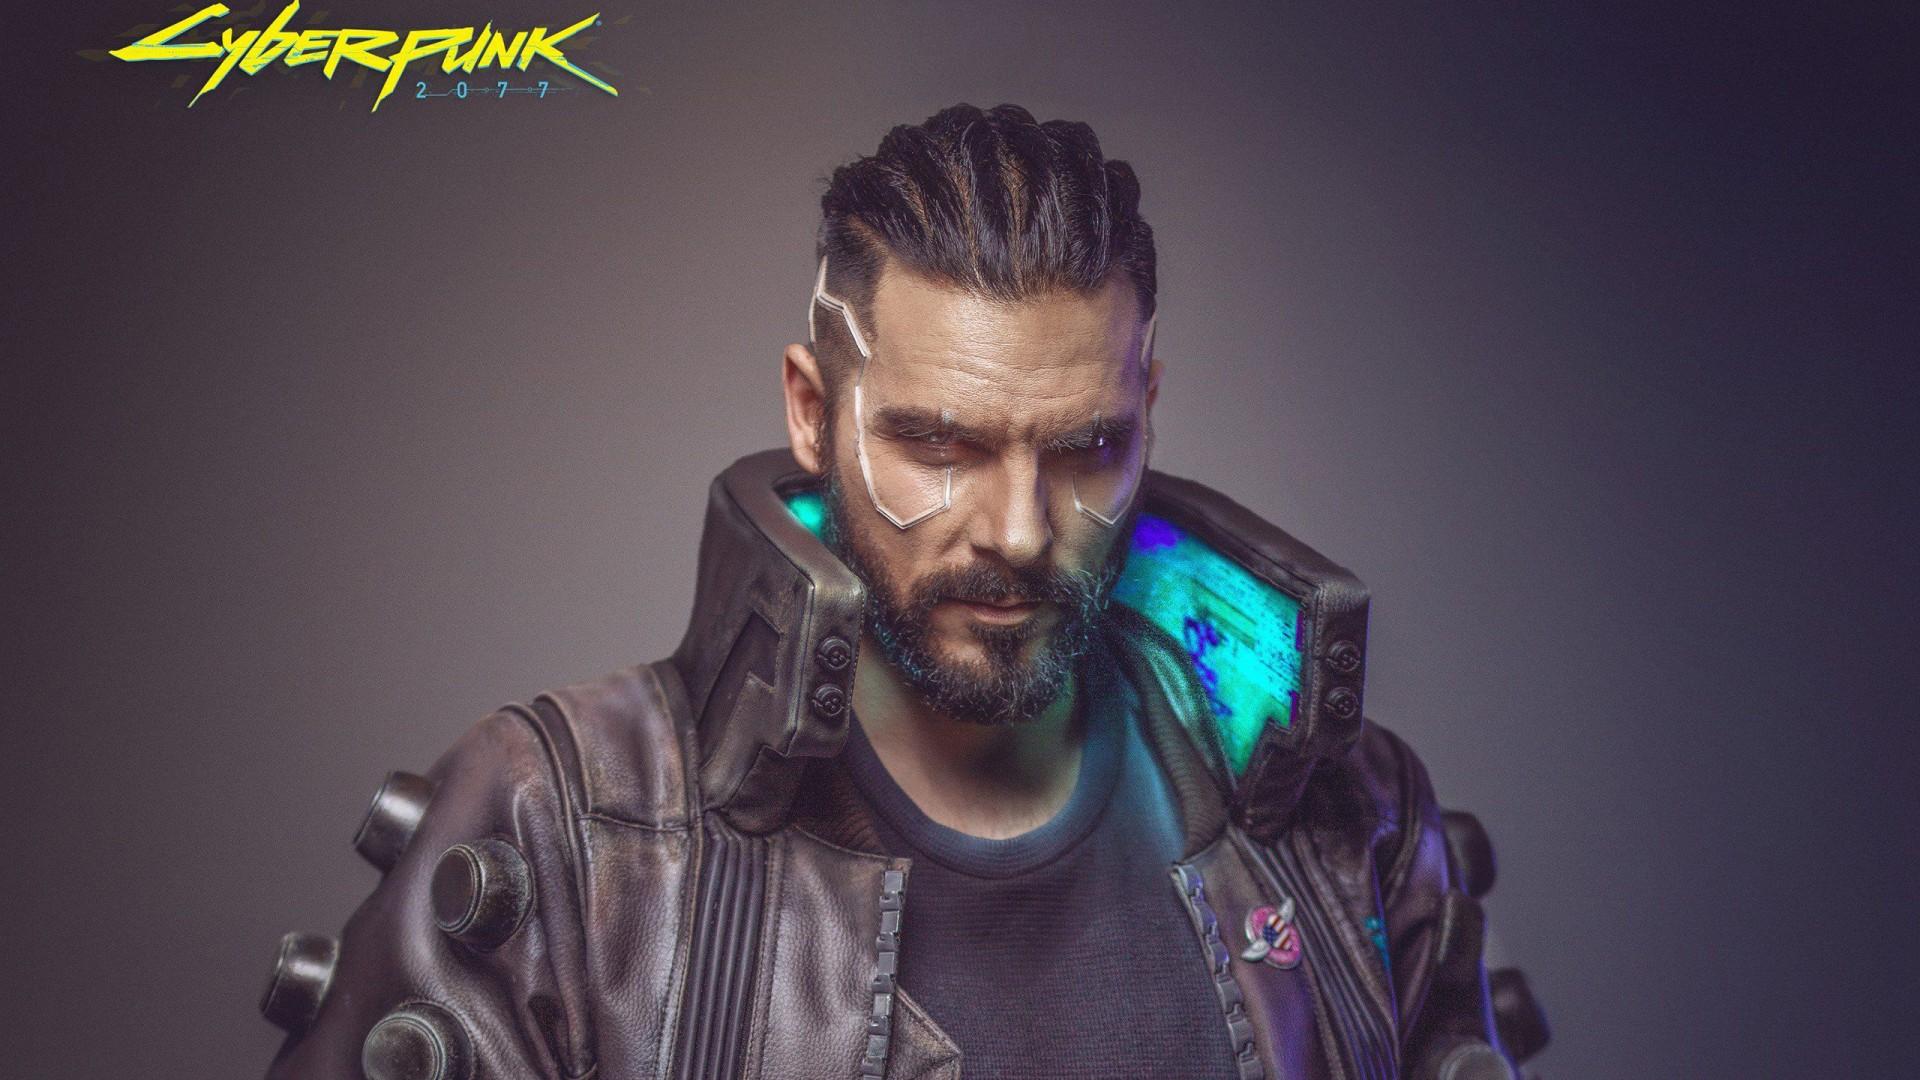 3d Wallpapers Buy Online Cyberpunk 2077 Male Cosplay Wallpapers Hd Wallpapers